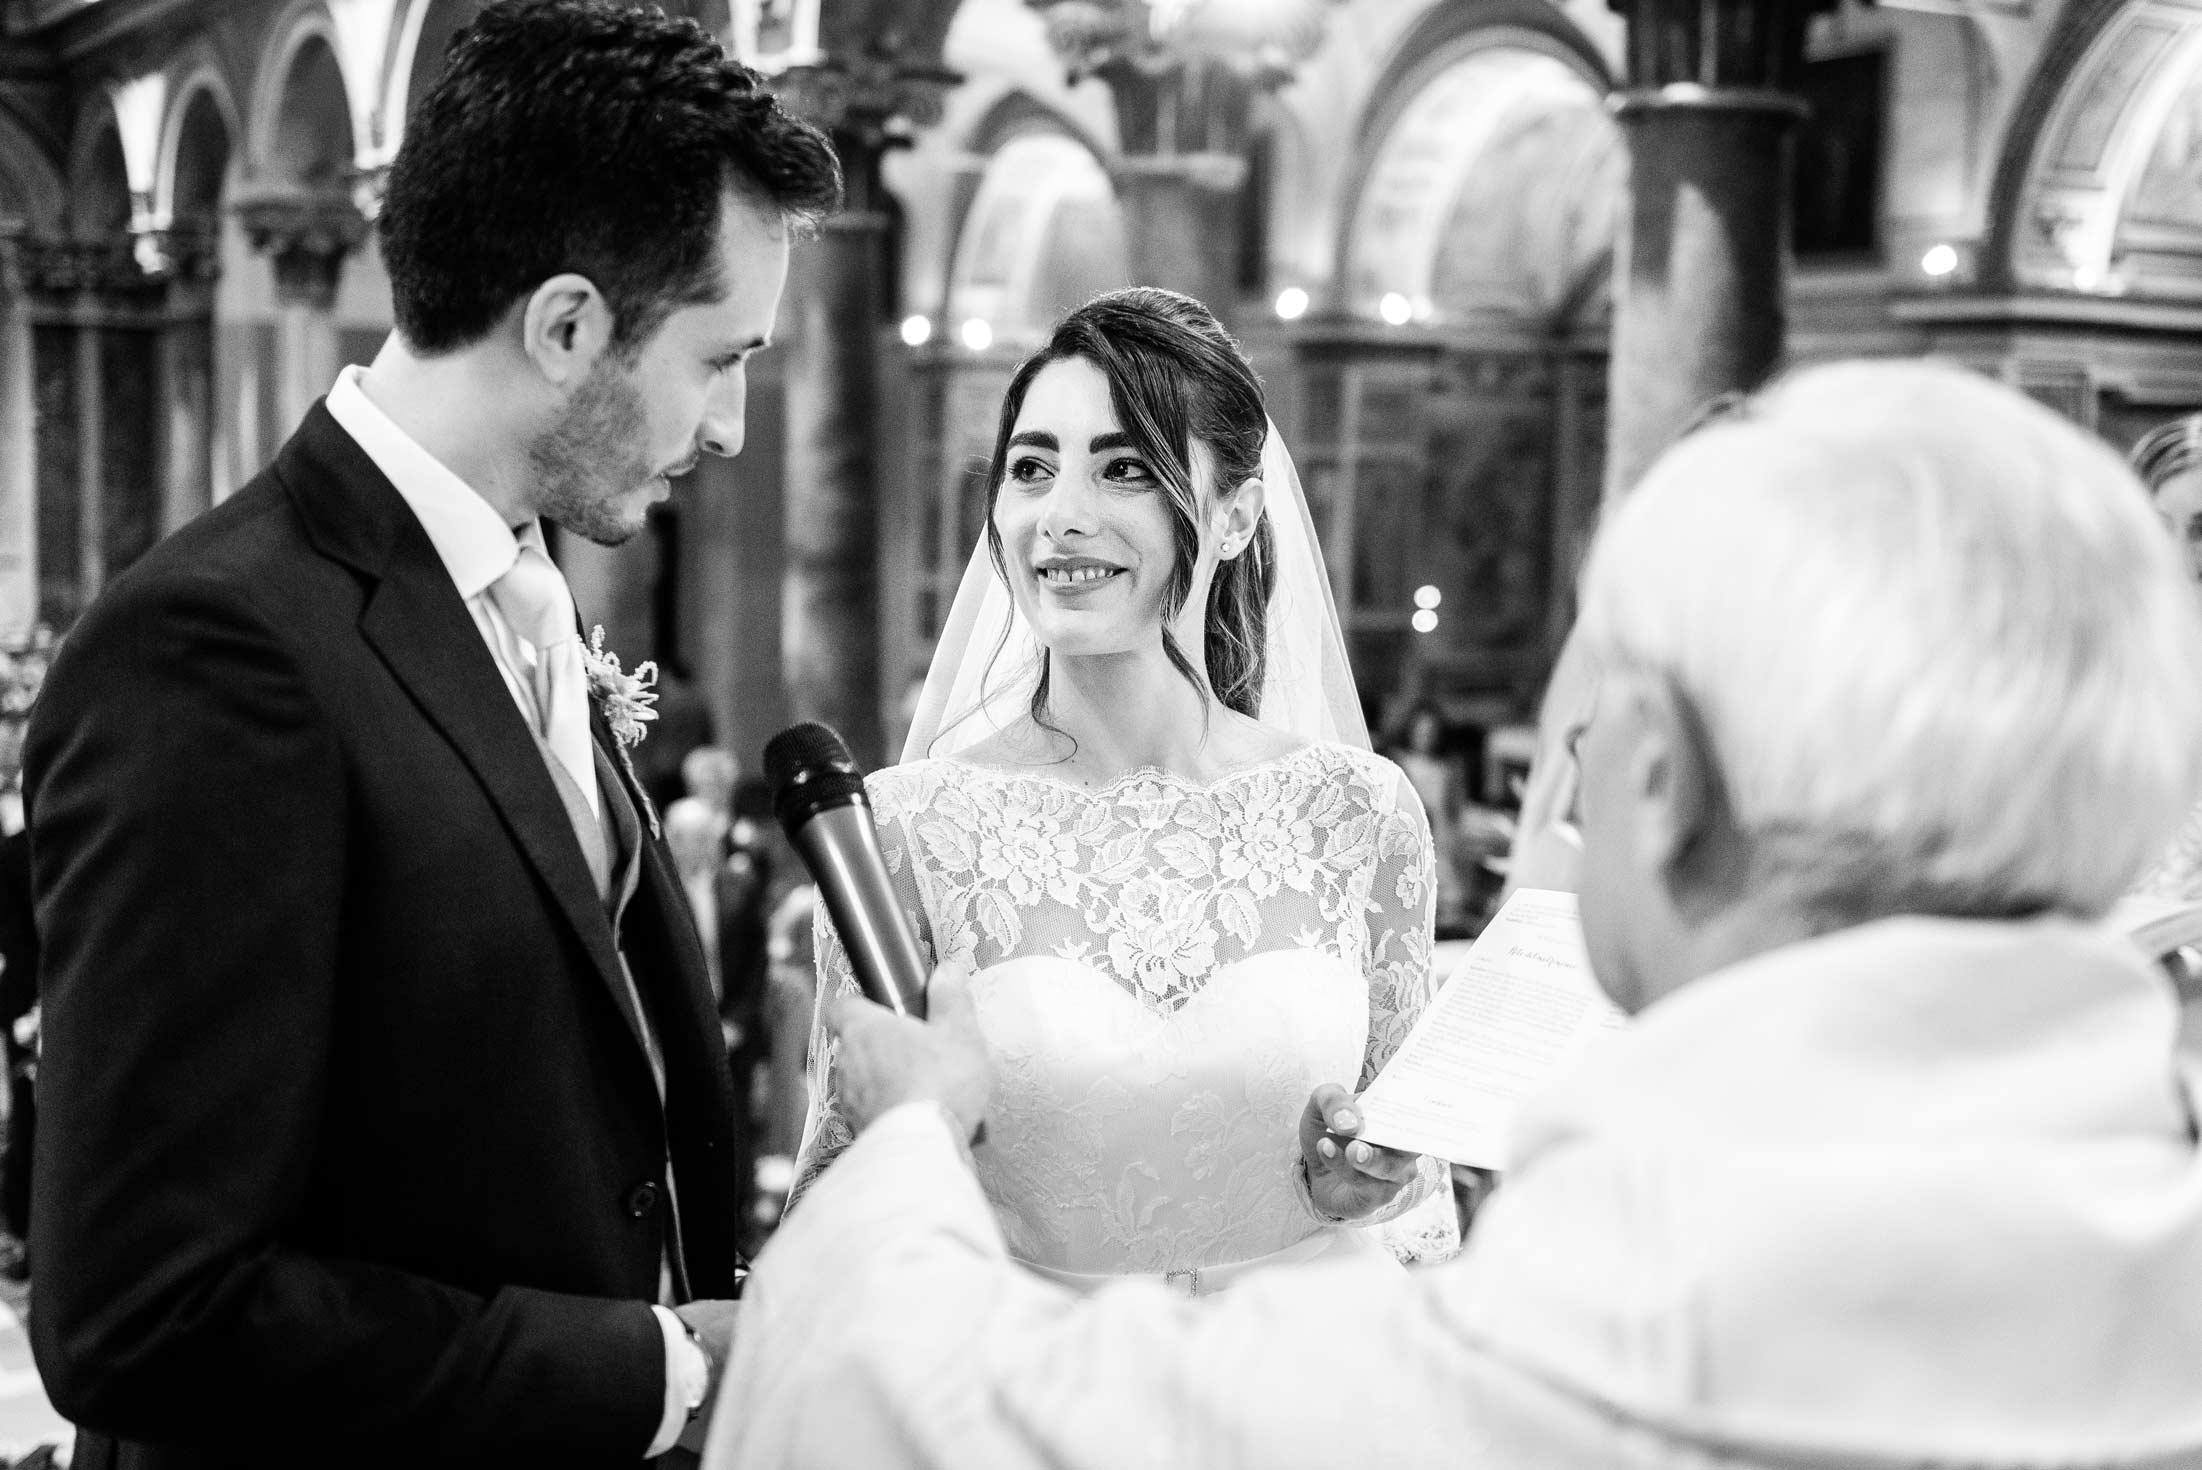 Fotografo-Matrimoni-Roma-Reportage-Cerimonia-1